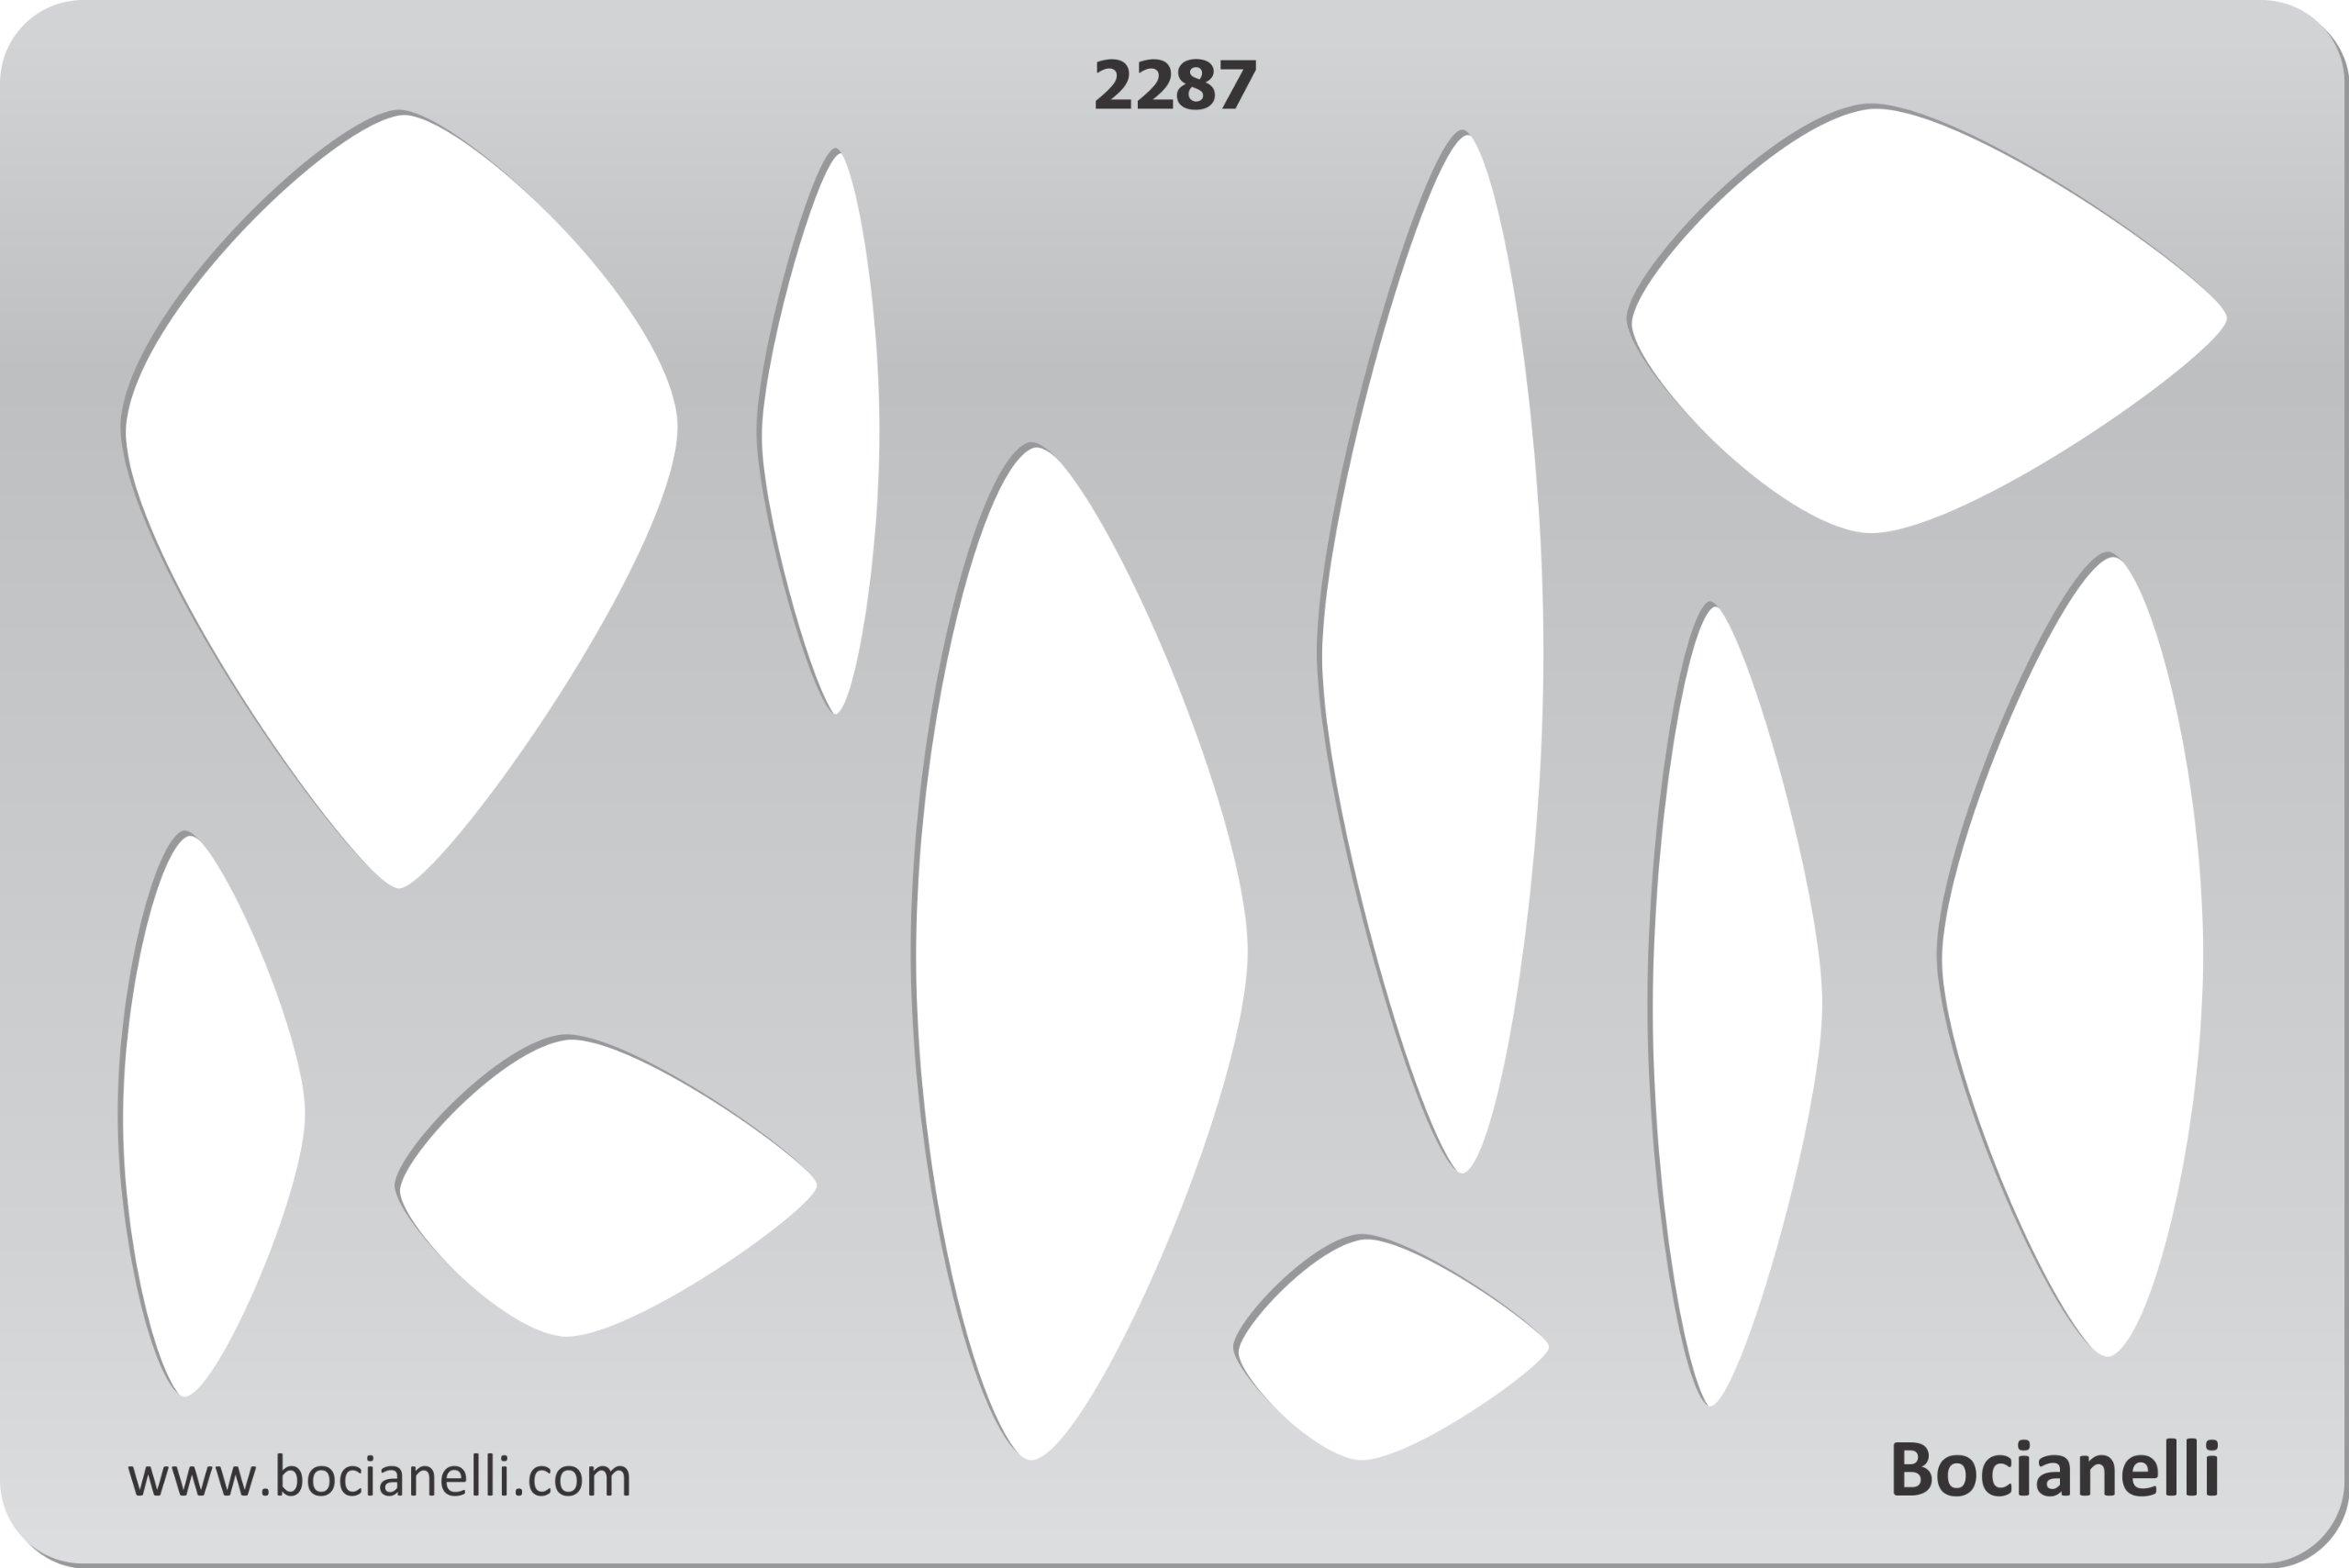 Amazon.co.uk: Bocianelli: Jewellery Design Templates